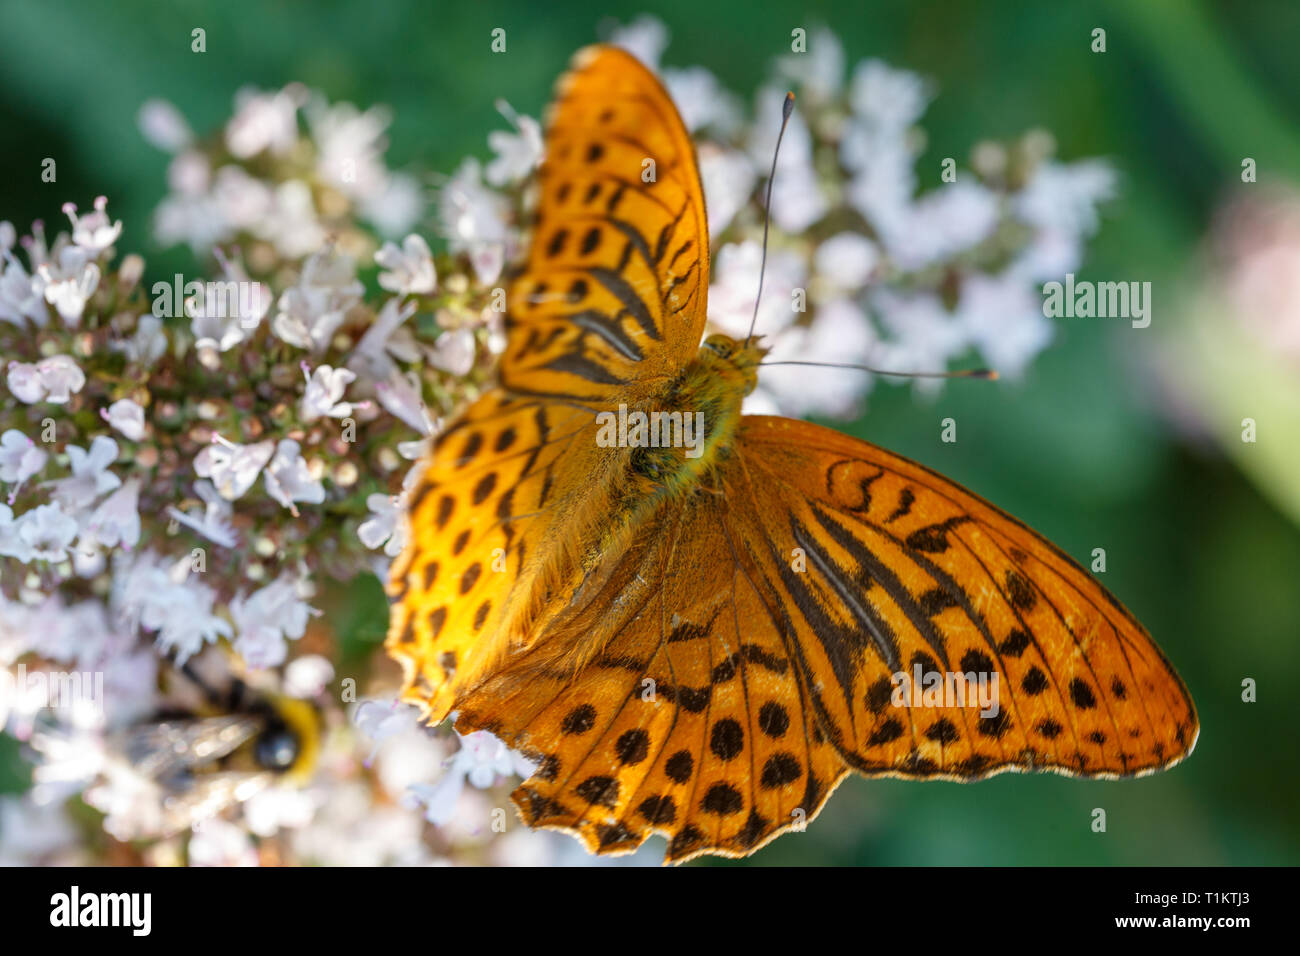 Silver washed fritillary. Argynnis paphia, orange butterfly on oregano or mint flowers - Stock Image